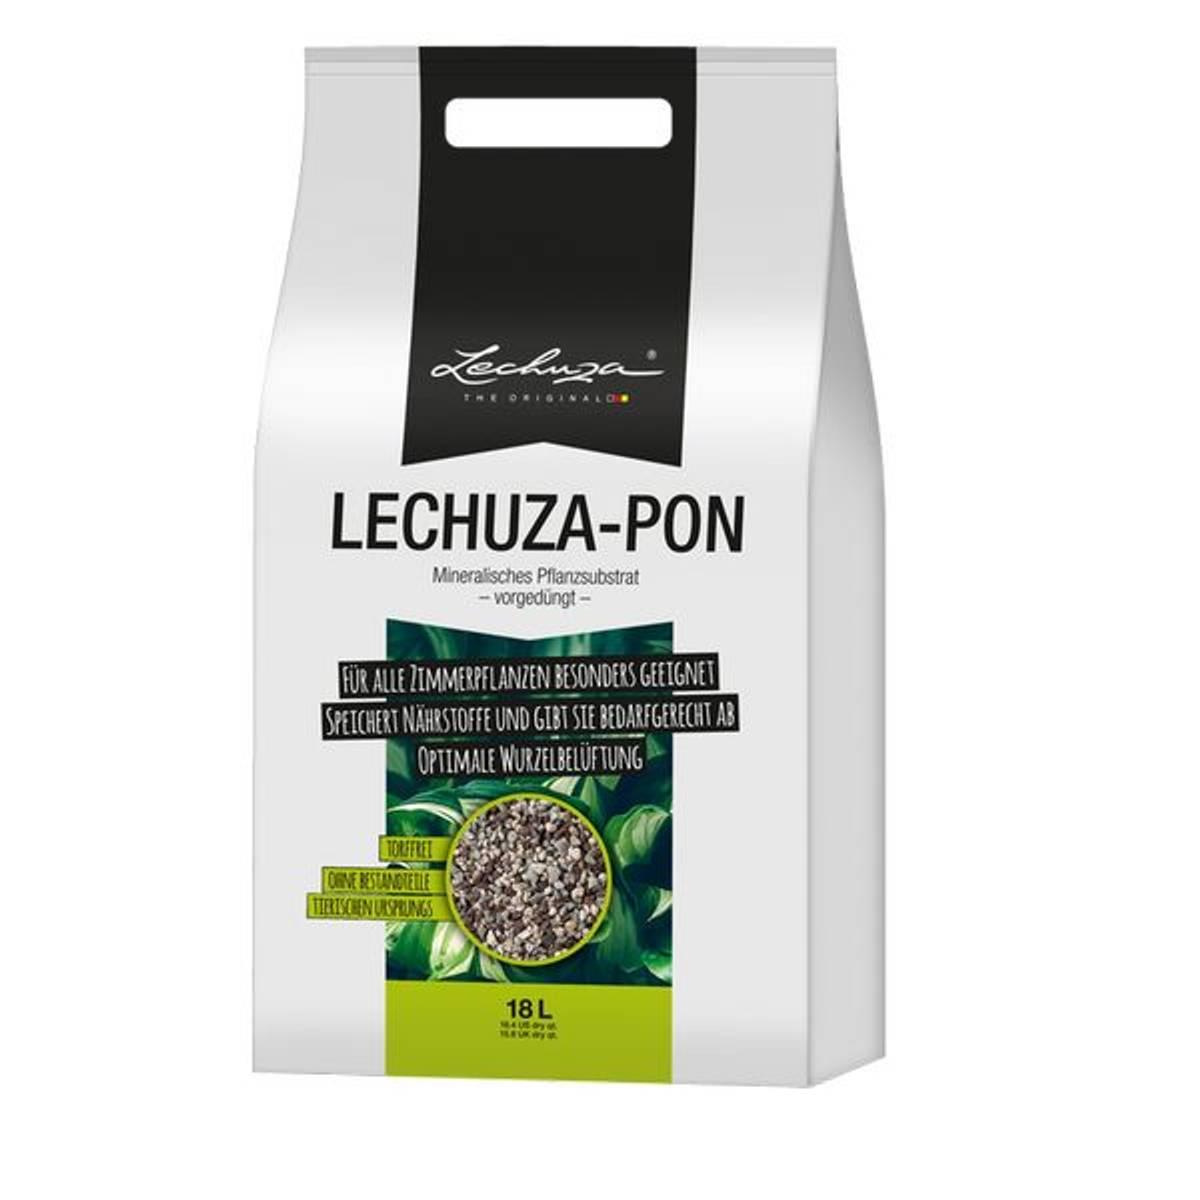 LechuzaPon 18 liter, Vekstmedium